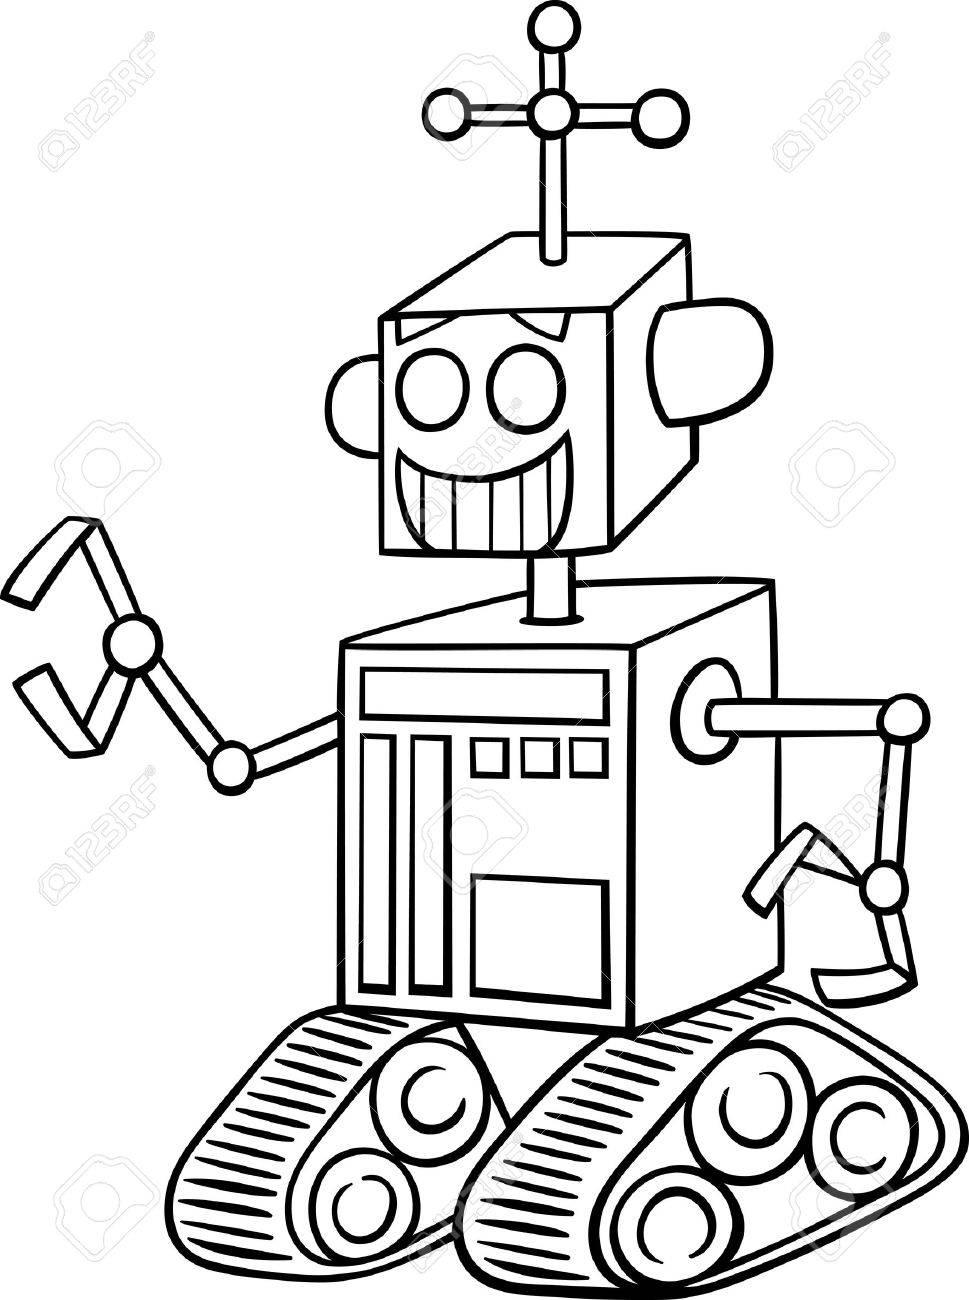 Black And White Cartoon Illustration Of Funny Robot Fantasy ...